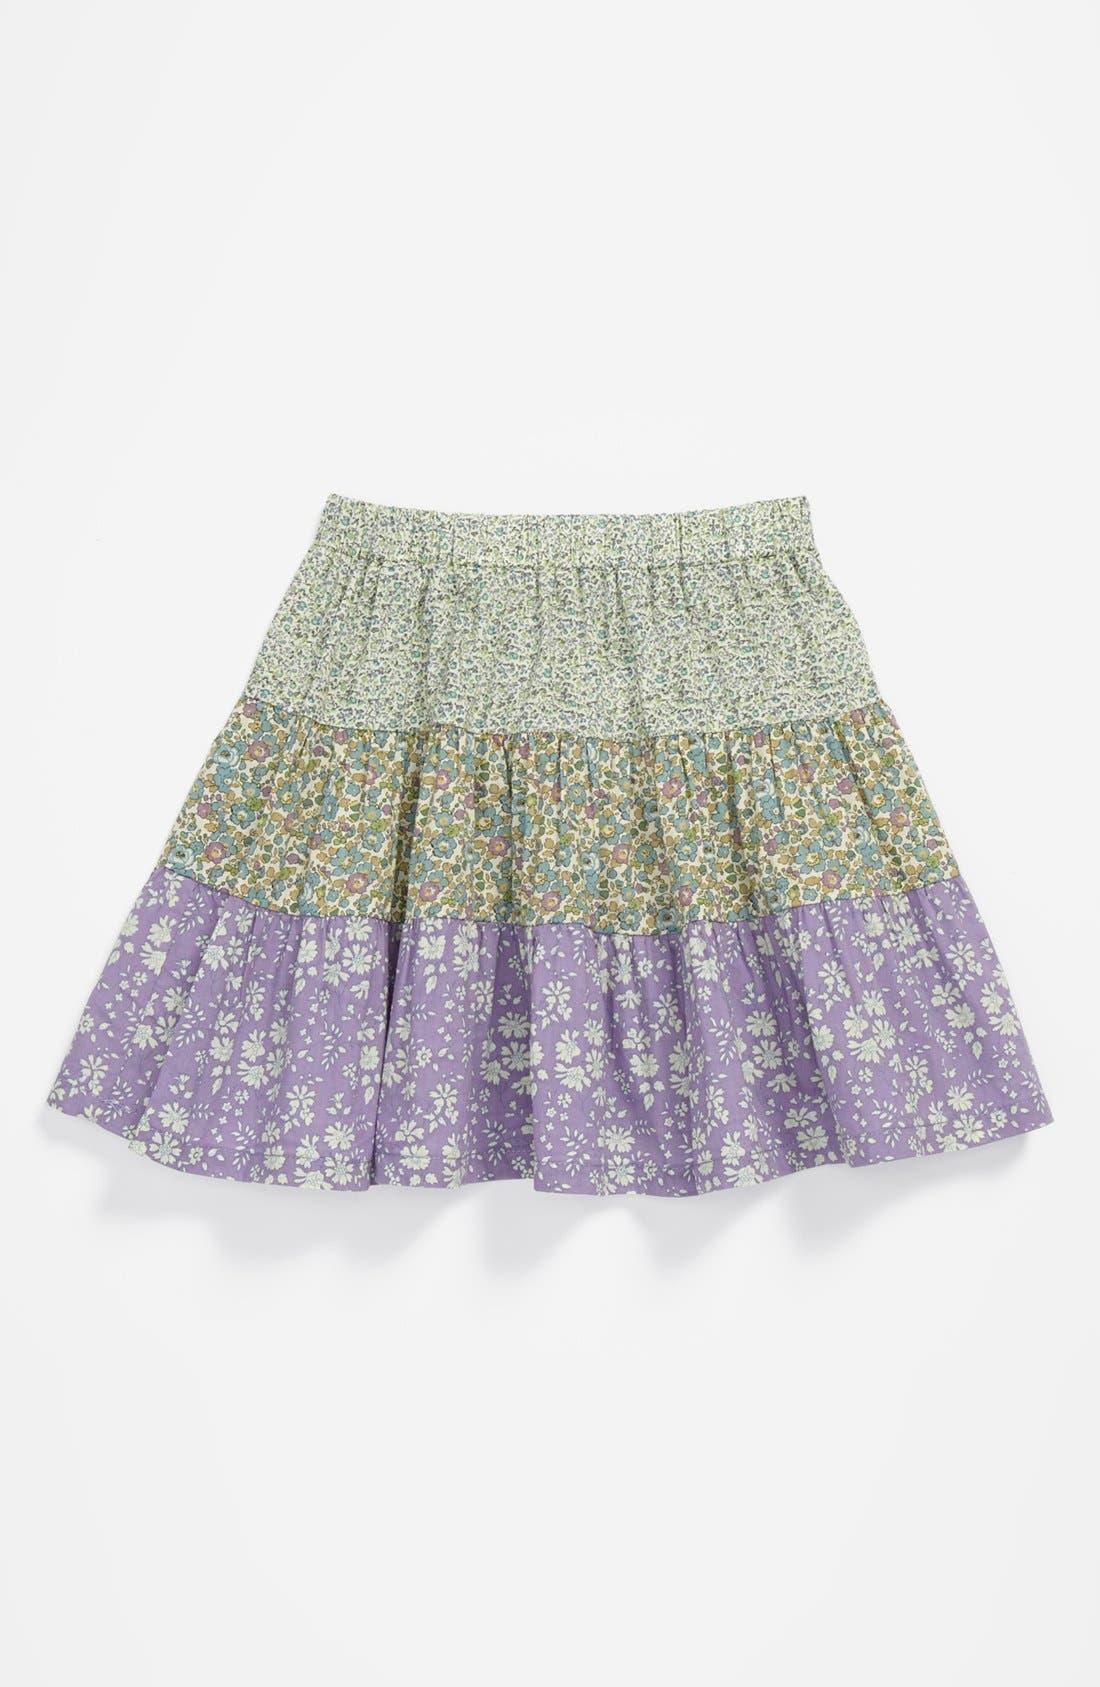 Alternate Image 1 Selected - Peek 'Edith' Skirt (Big Girls)